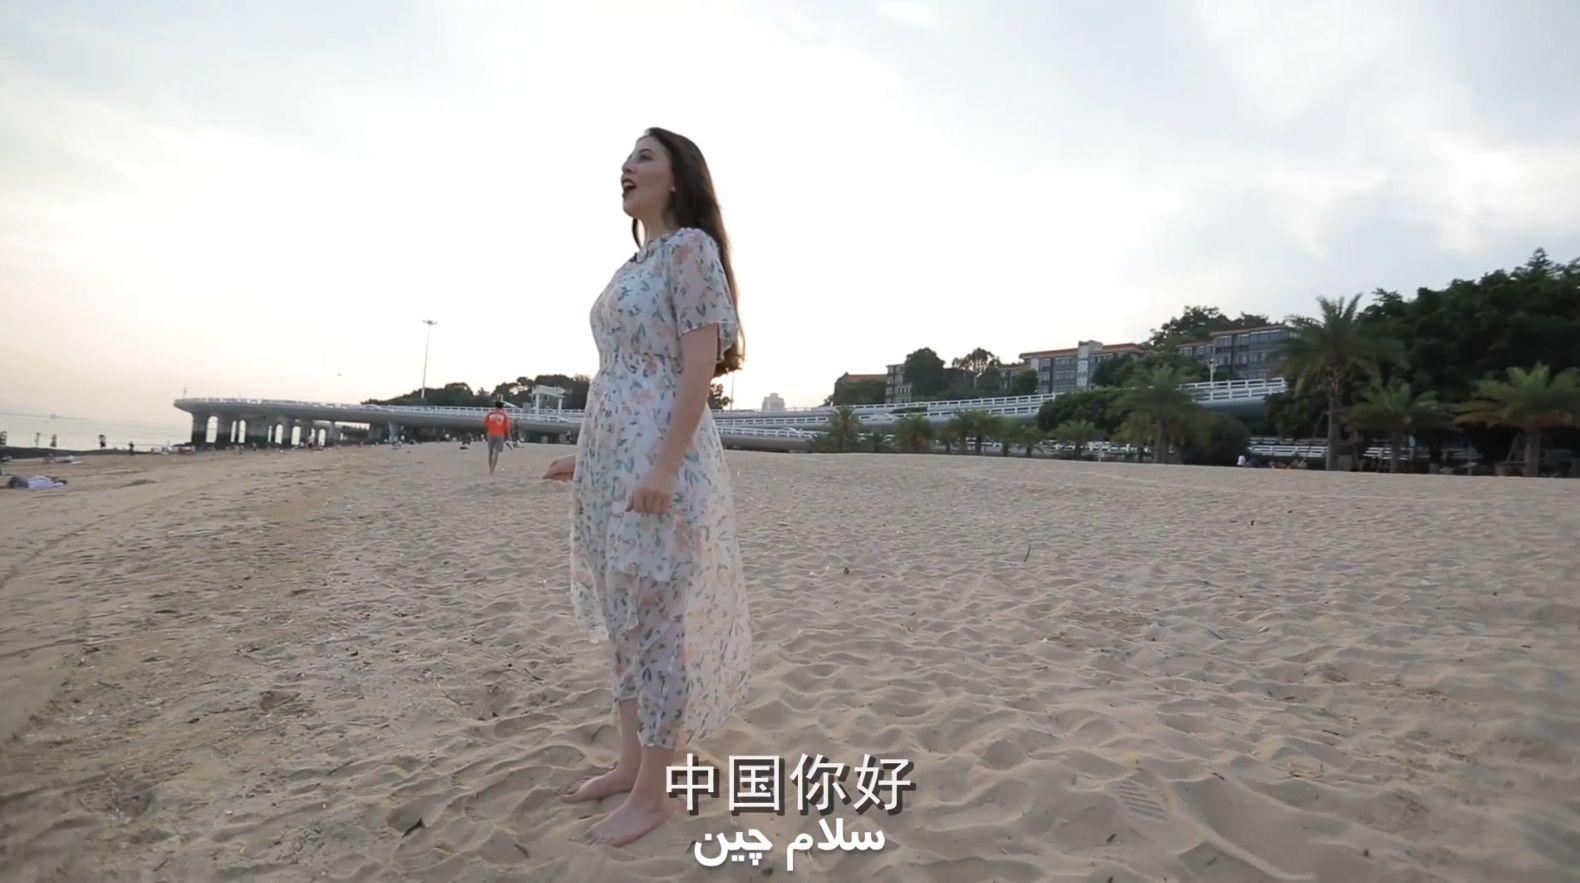 http://www.chinanews.com/cr/2019/0915/4045617596.jpg